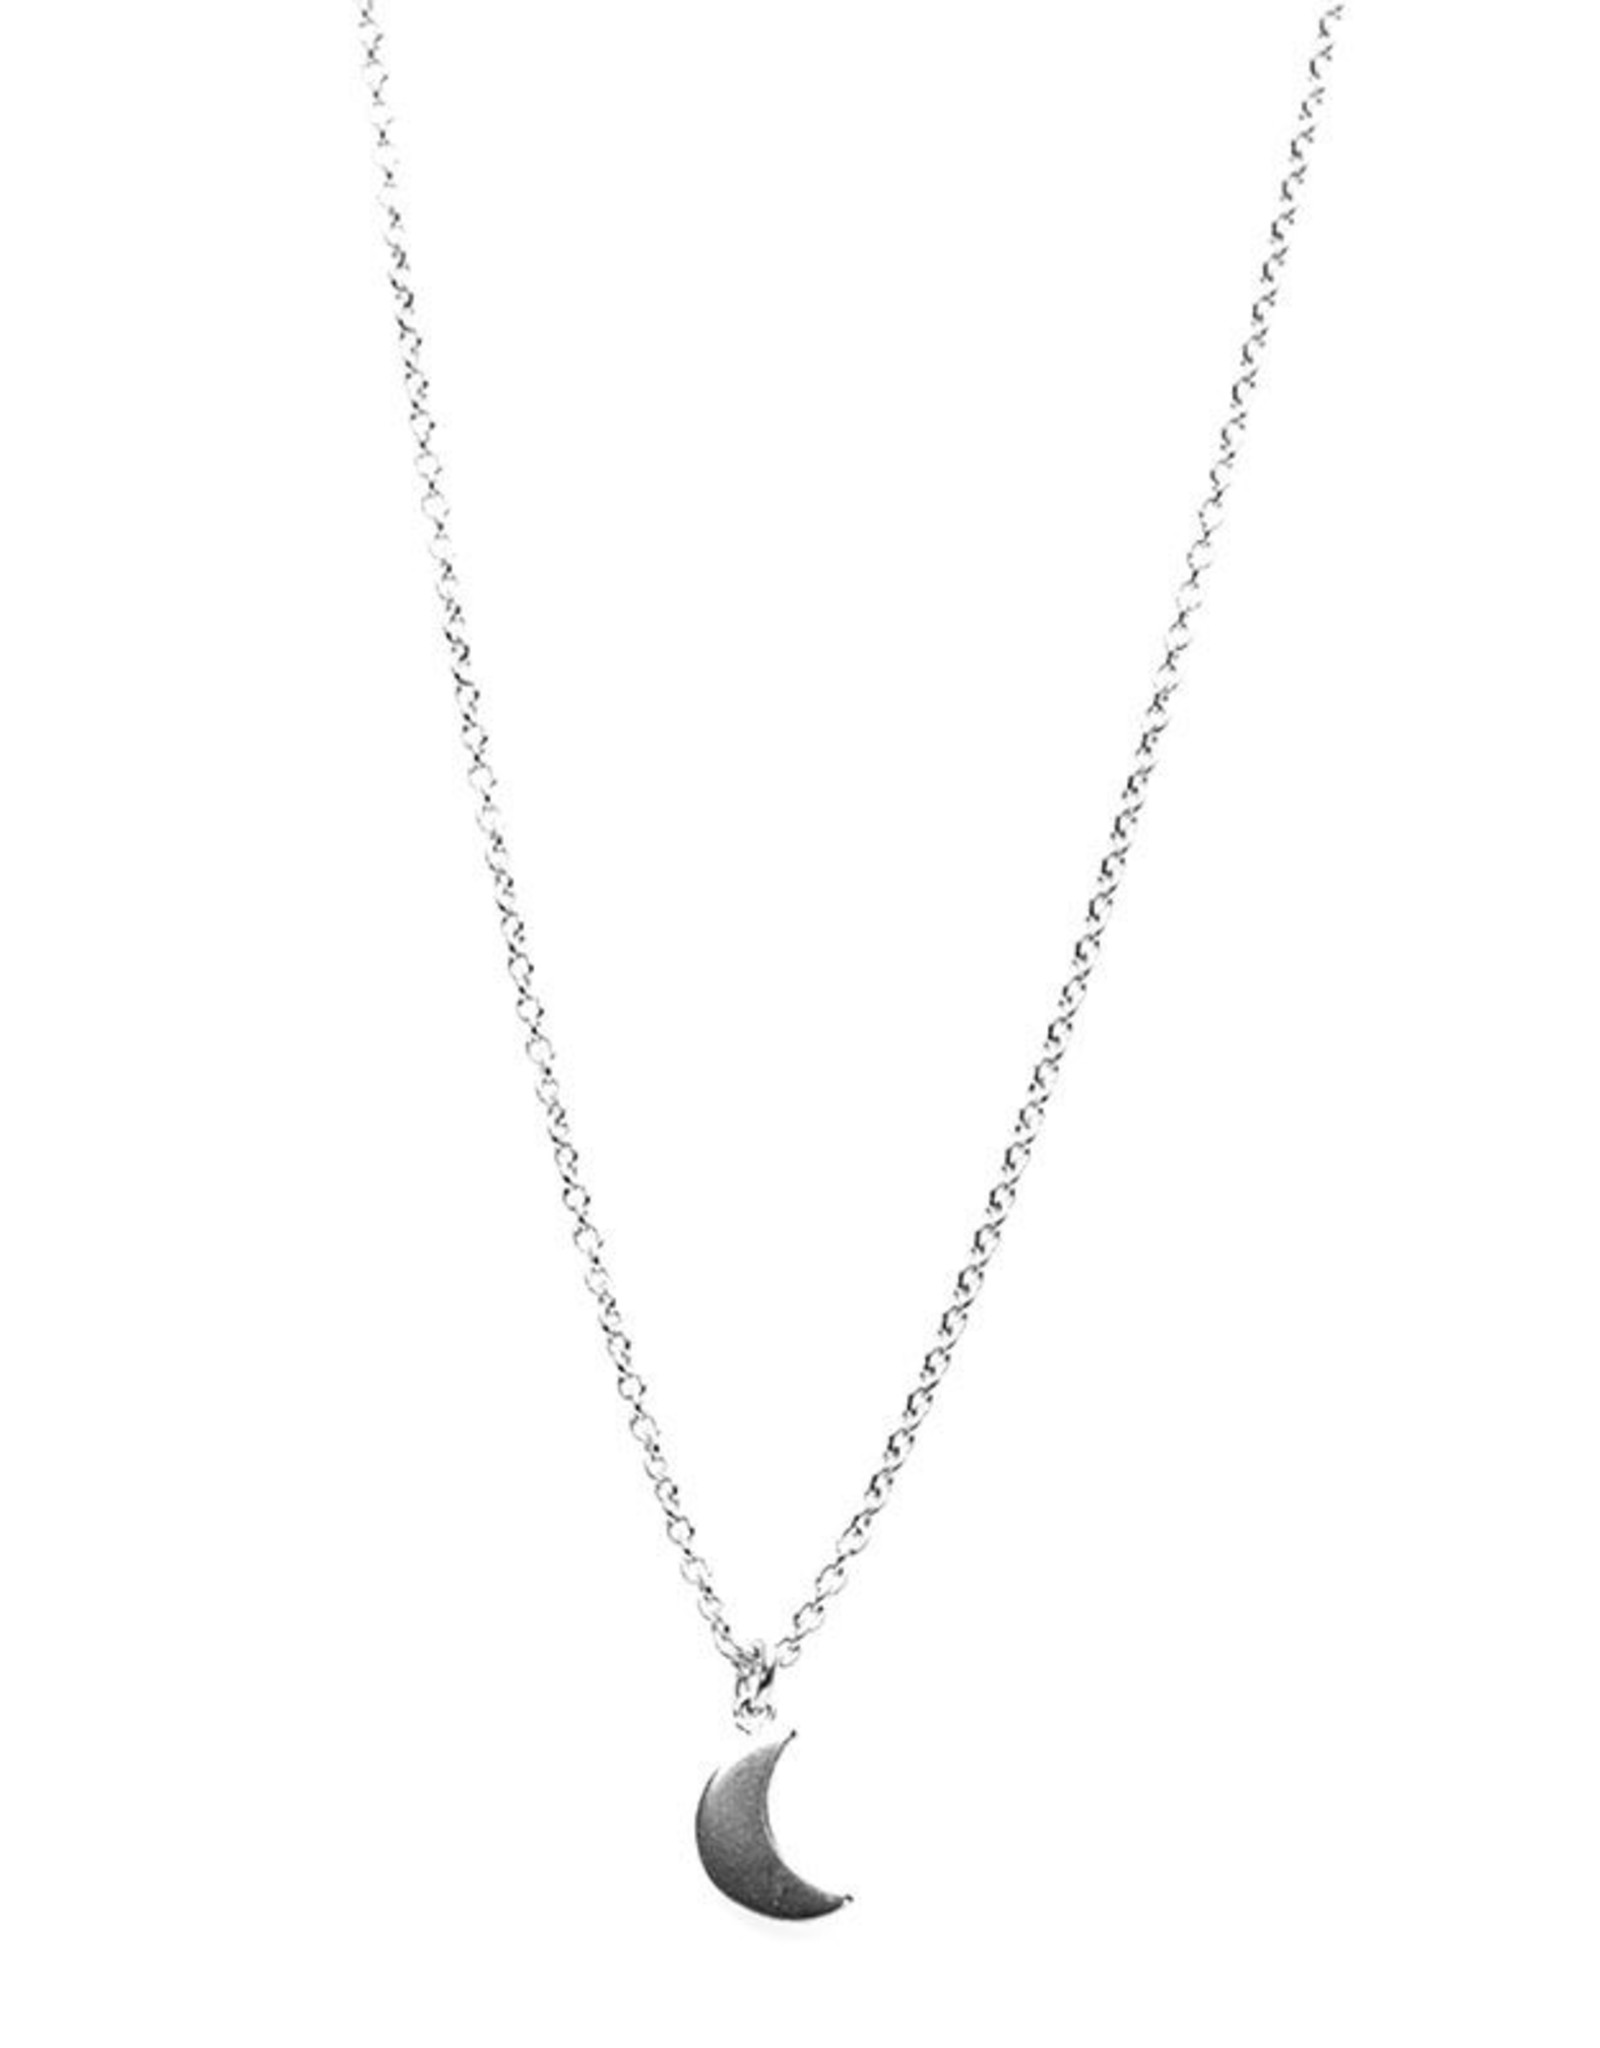 Karma Necklace Moon Silver